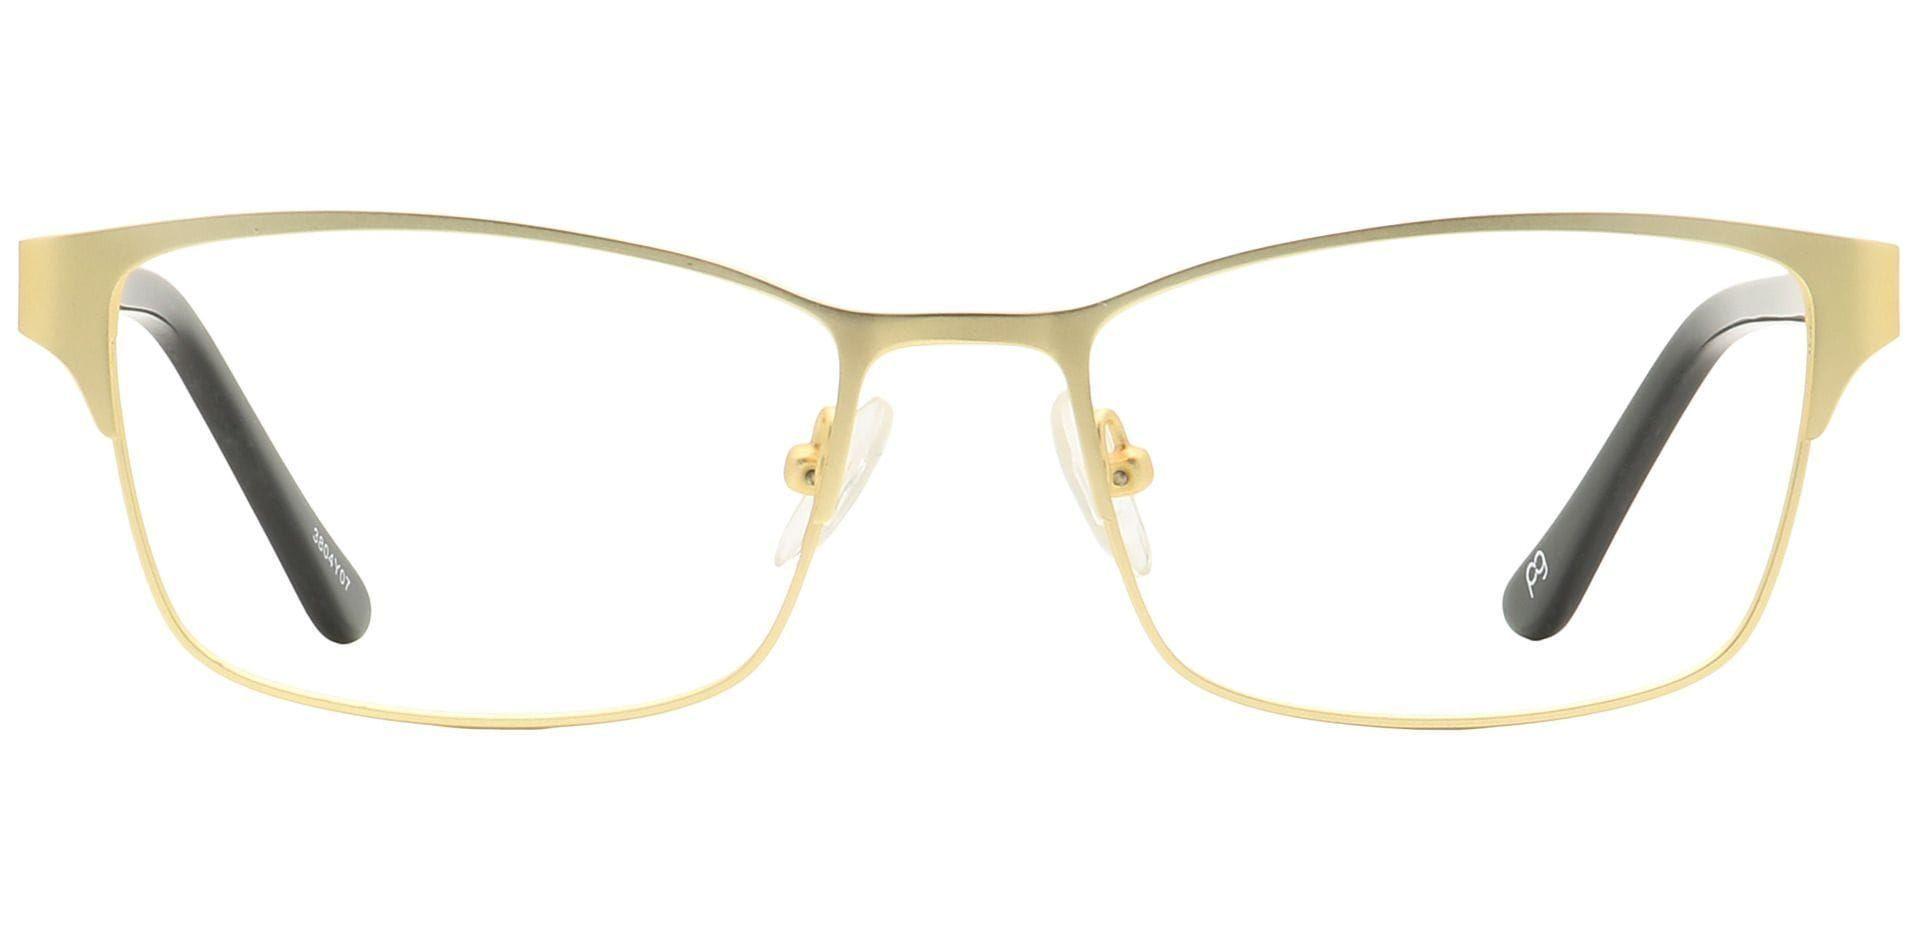 Leo Rectangle Blue Light Blocking Glasses - Yellow